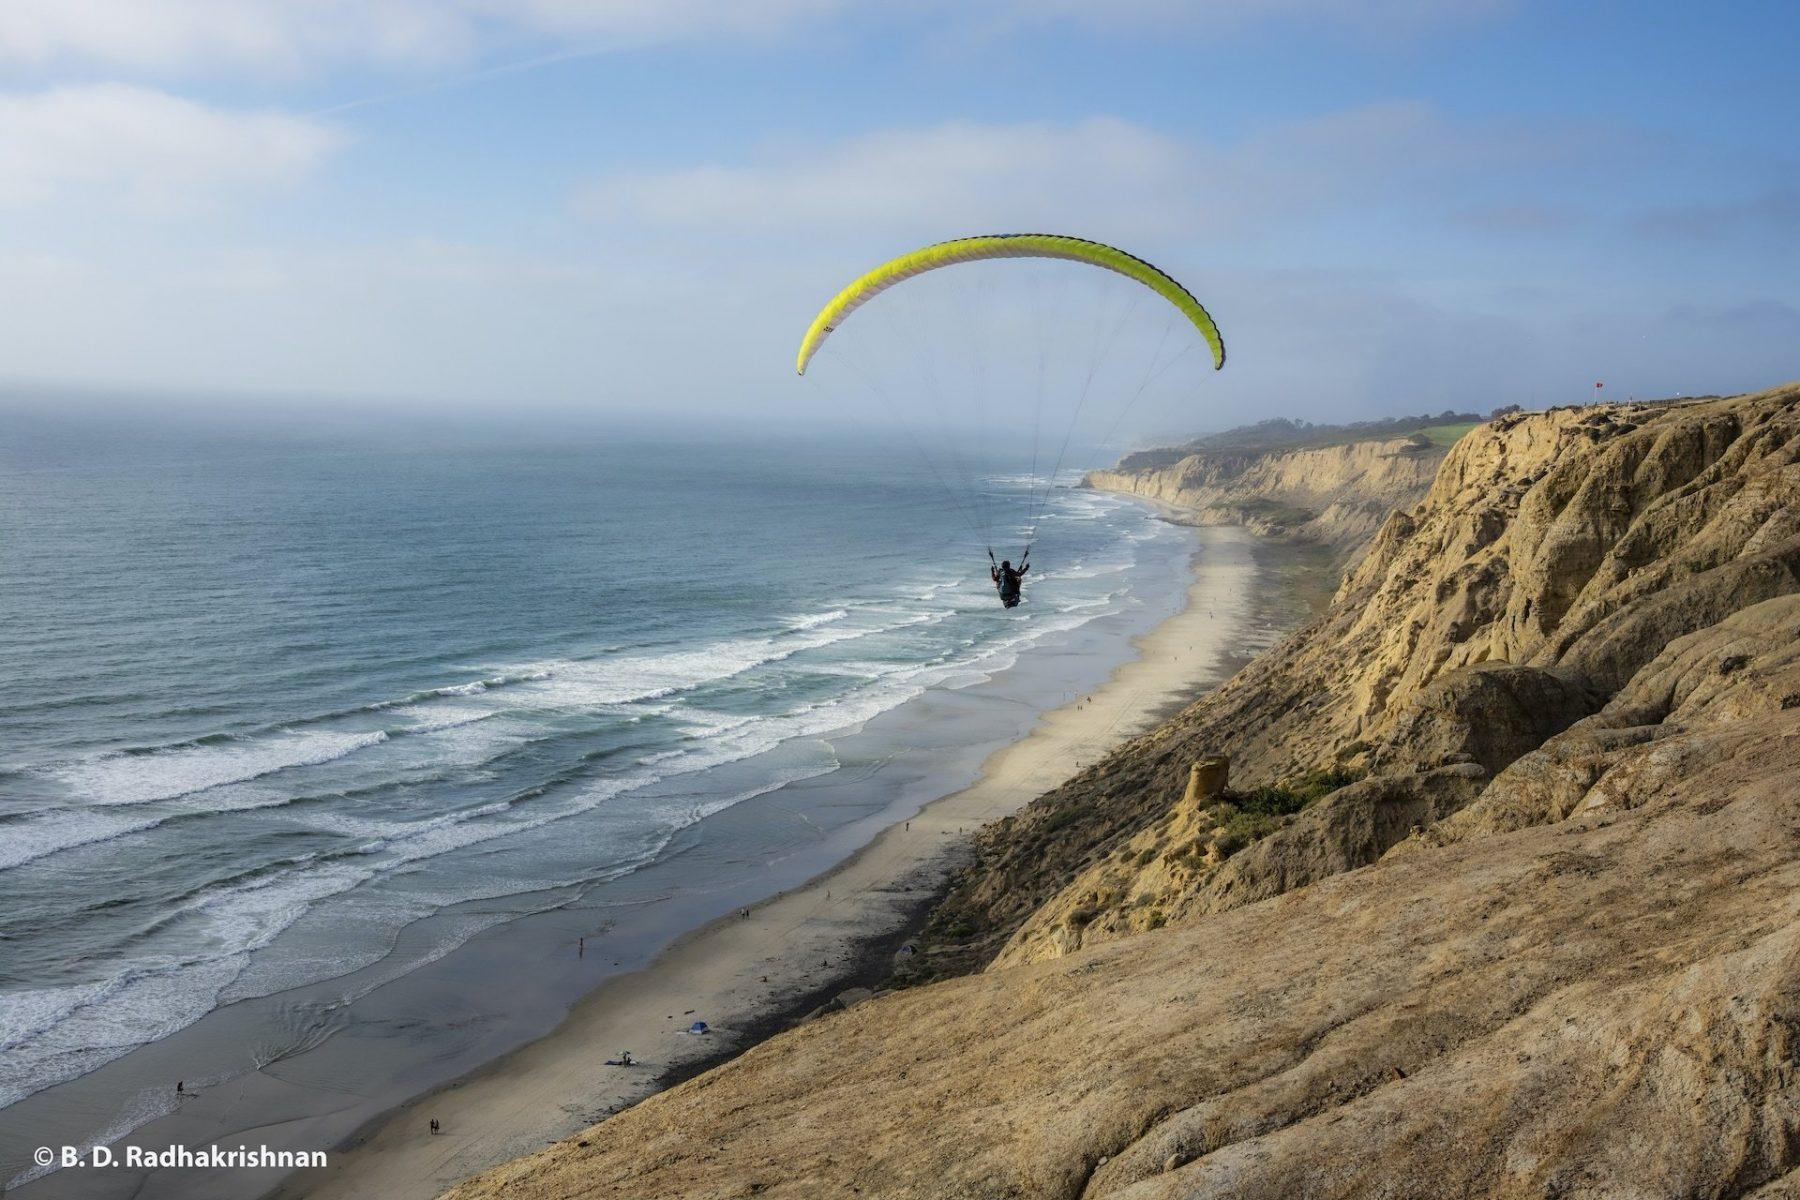 Ben Radhakrishnan - Glider Lost in the Negative Space